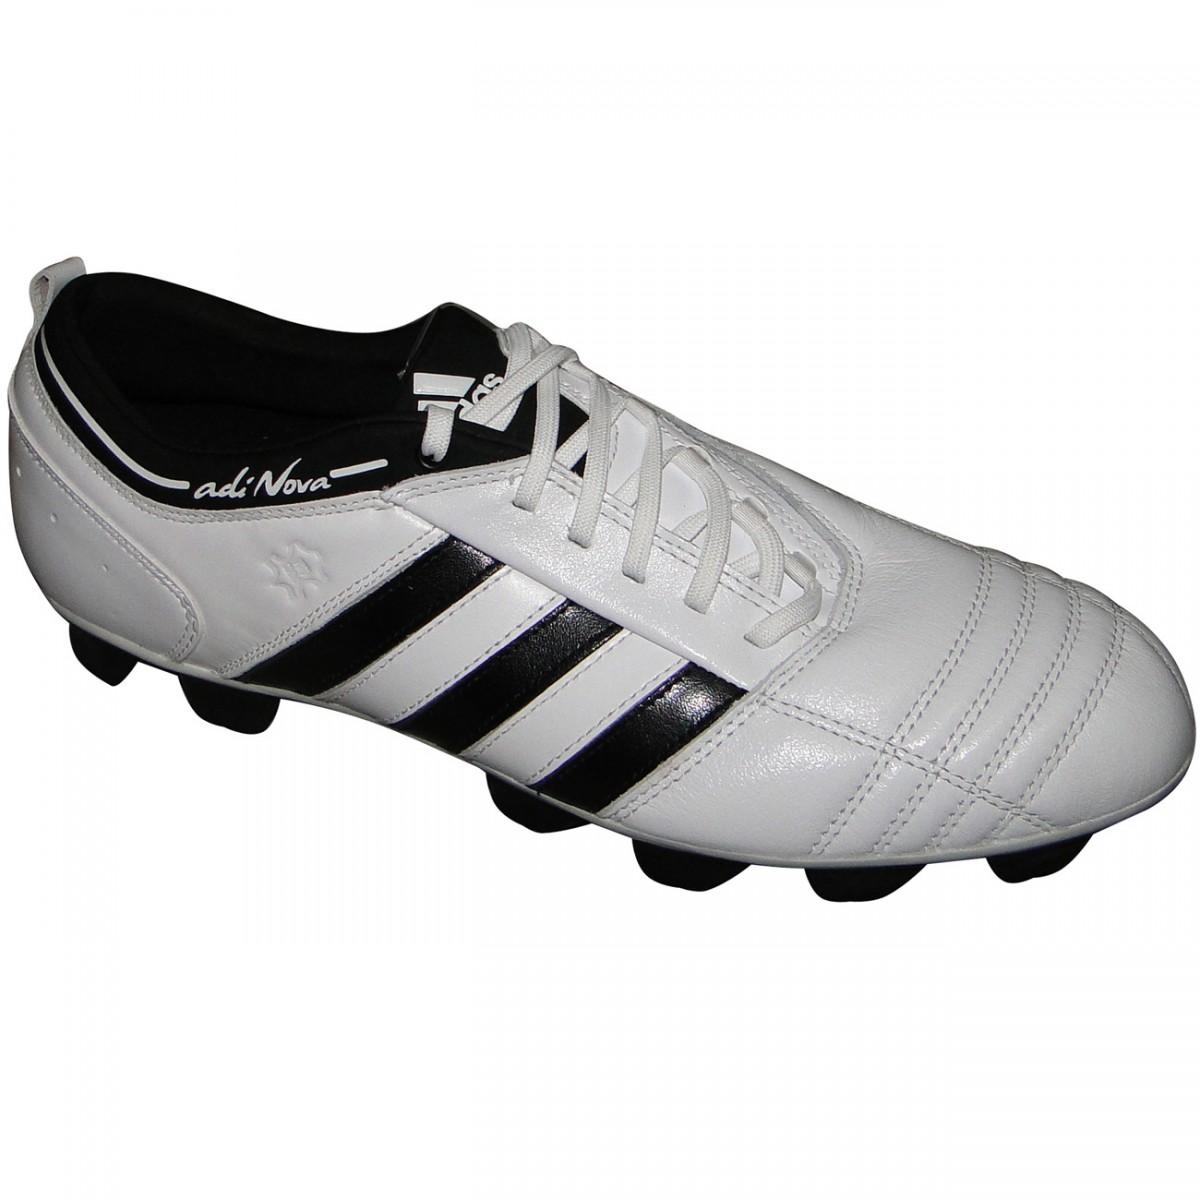 048b6f593c Chuteira Adidas Adinova Trx 9864 - BRANCO PRETO - Chuteira Nike ...